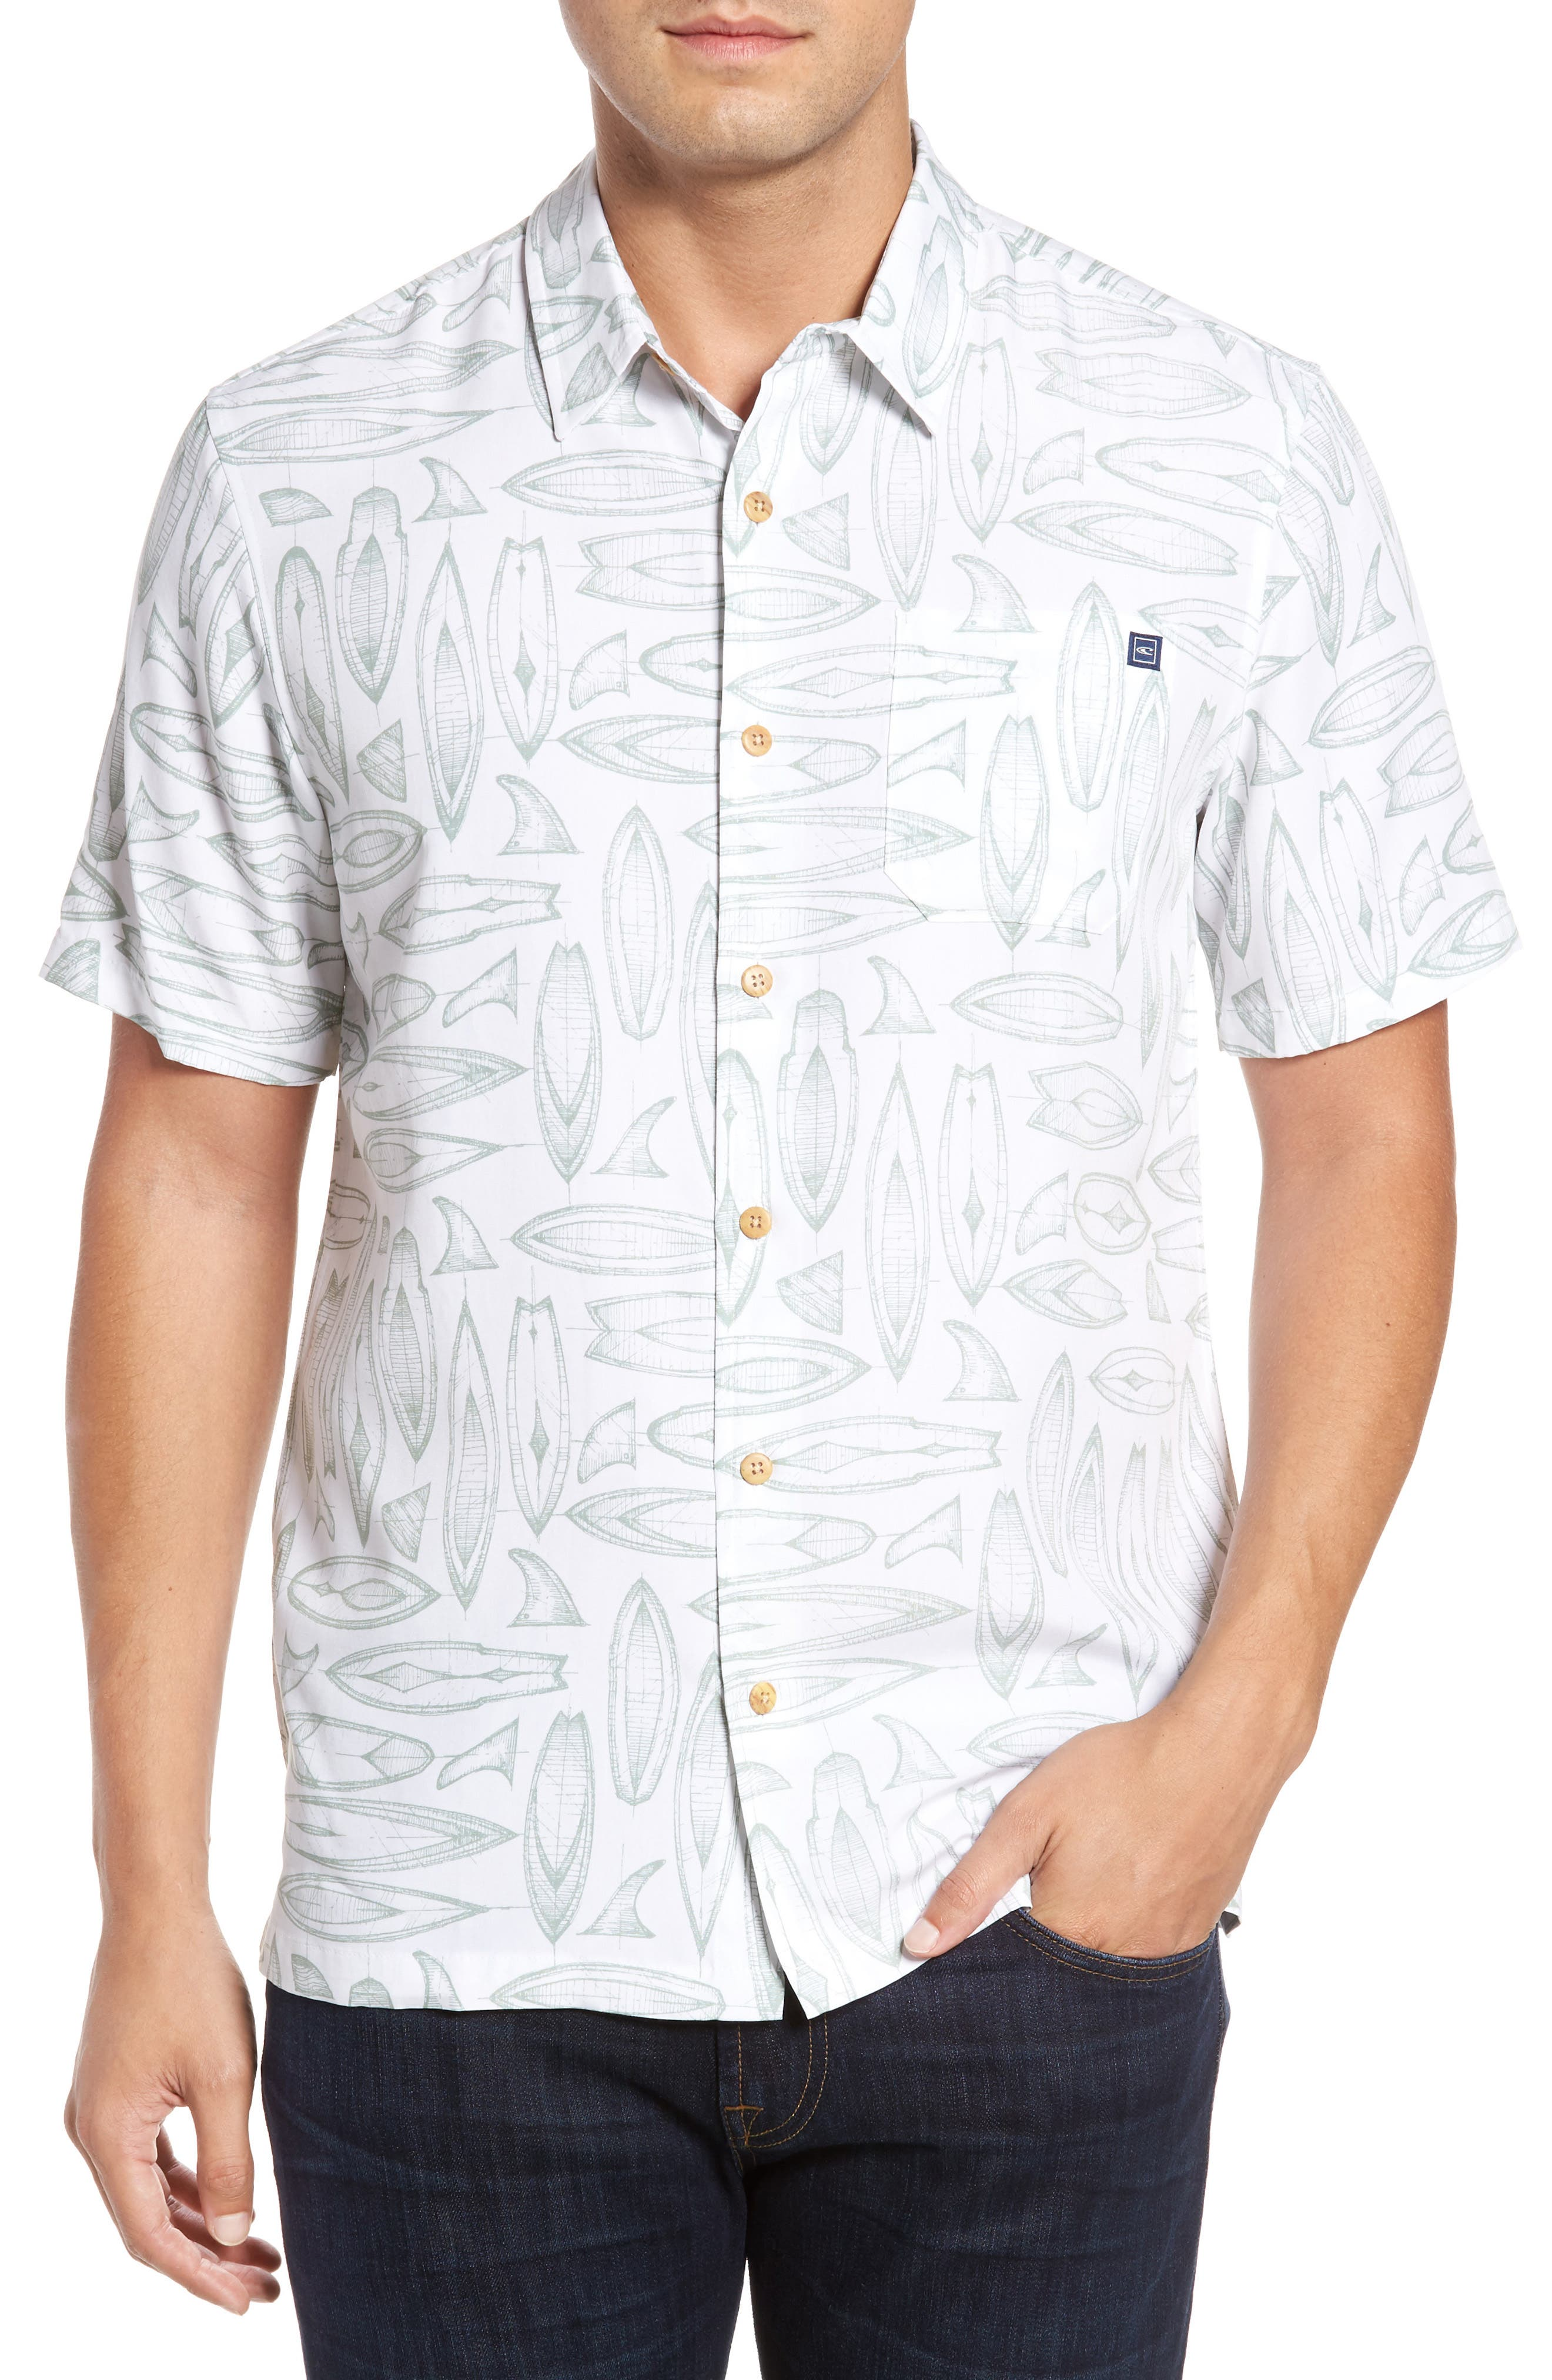 JACK ONEILL Waveriders Print Camp Shirt